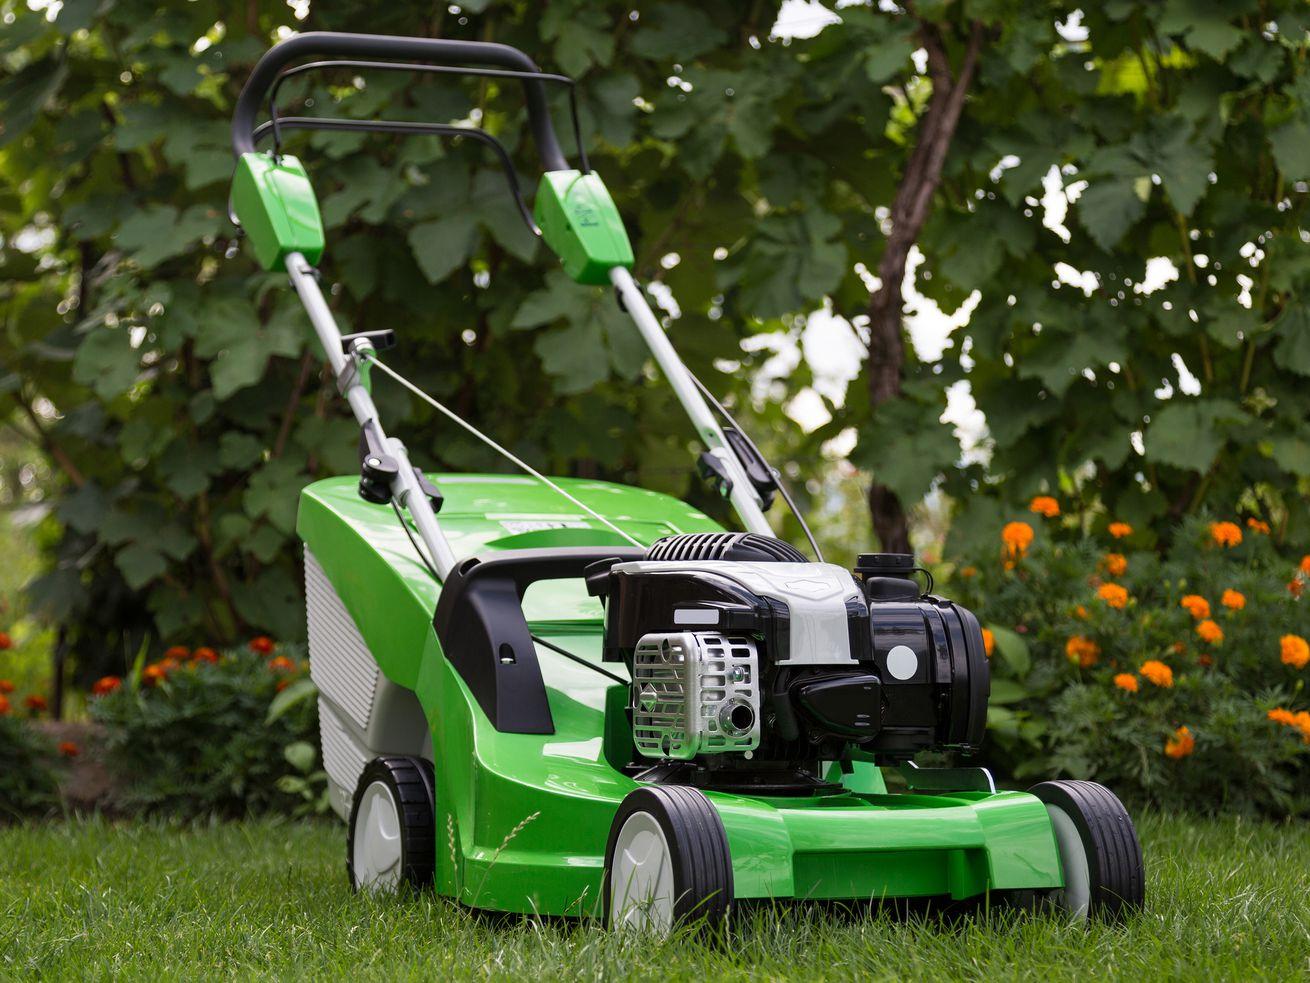 Green lawn mower.